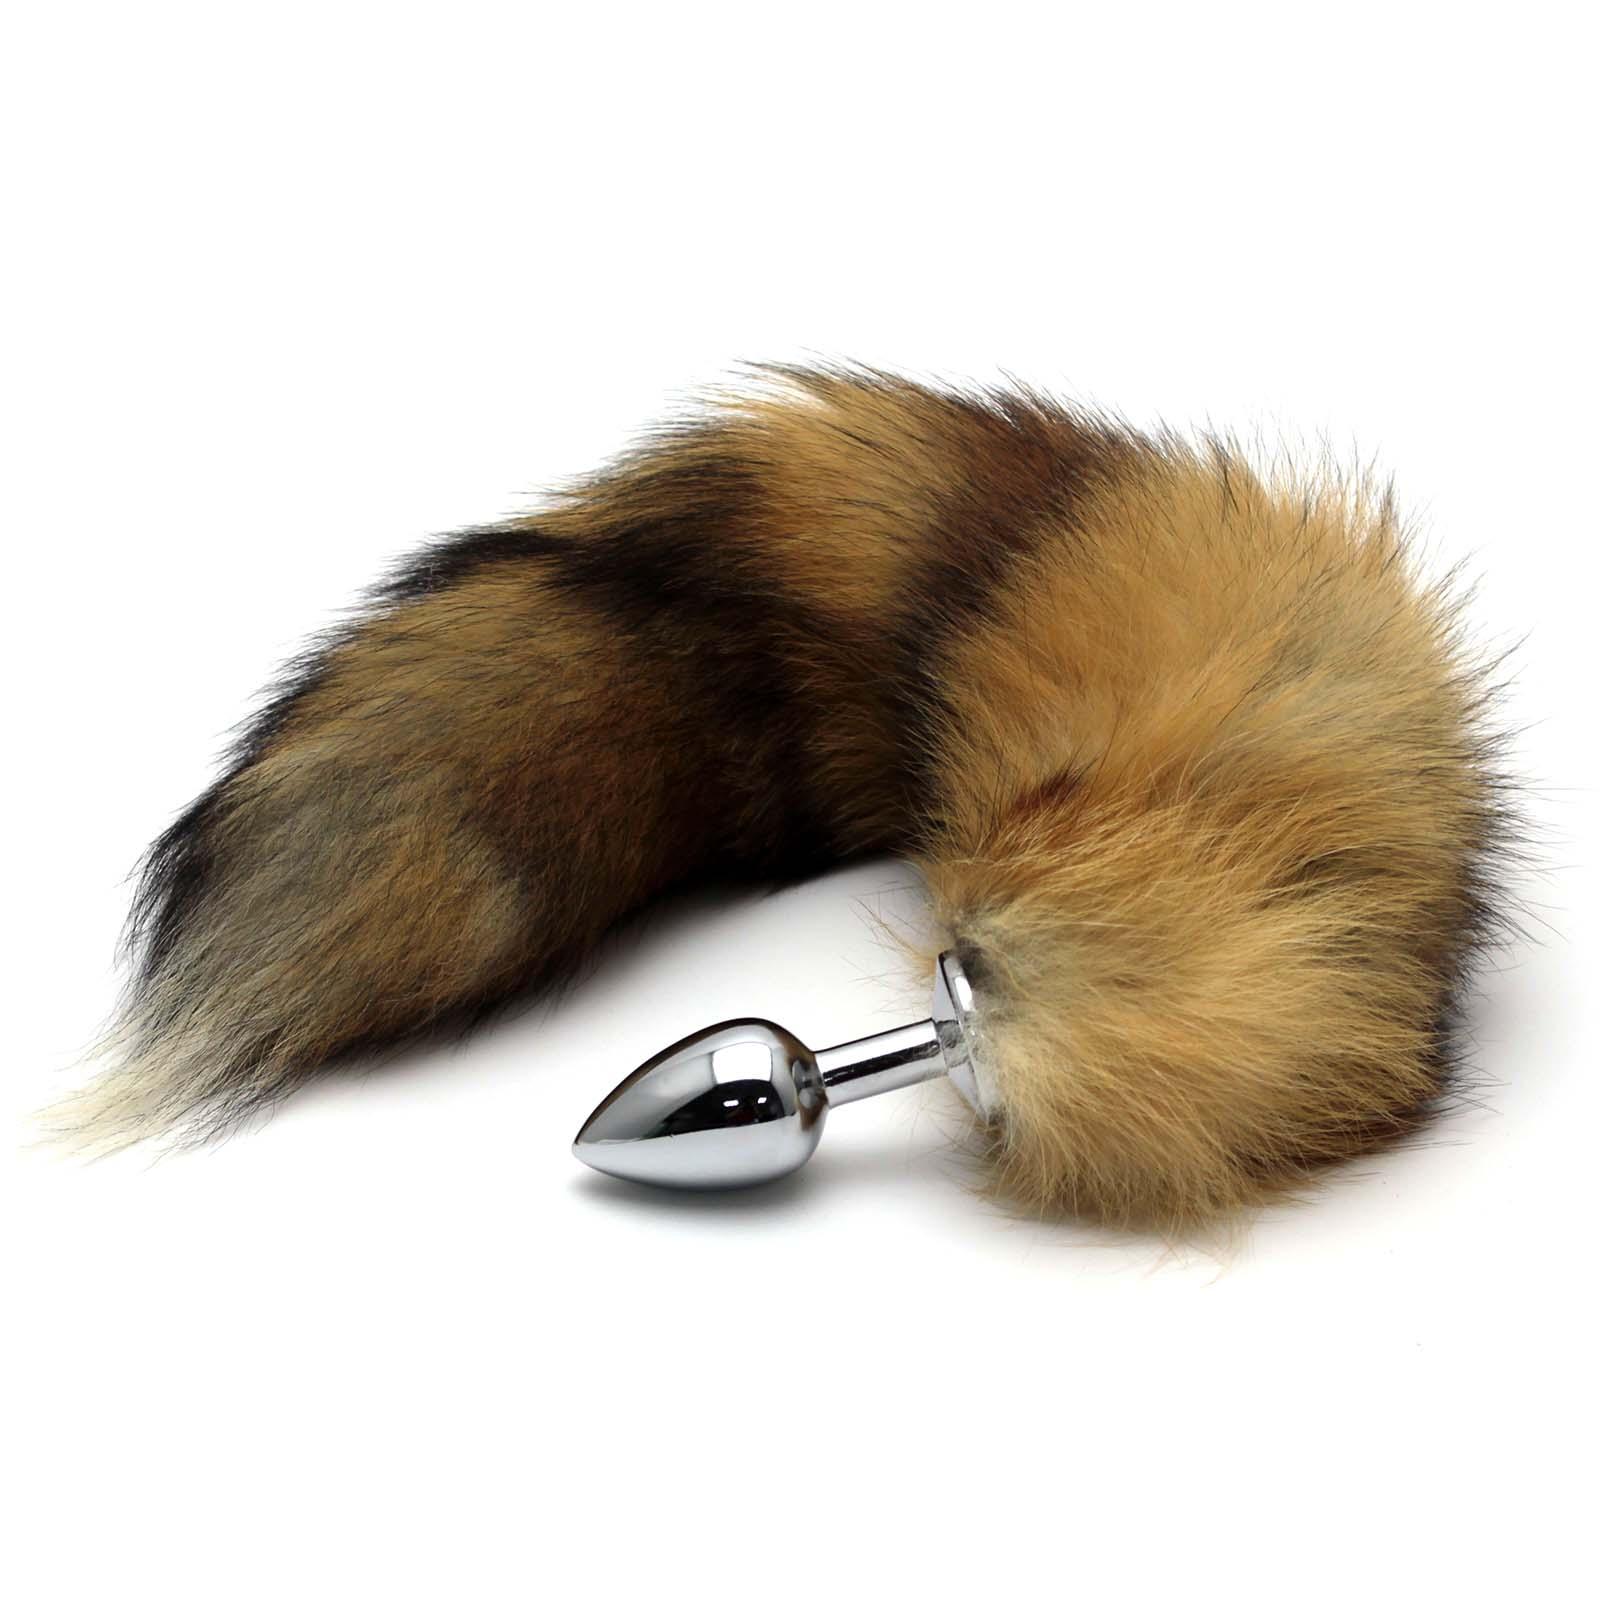 Aliexpresscom  Buy Massager Stopper Fox Tail Metal Toy -7992